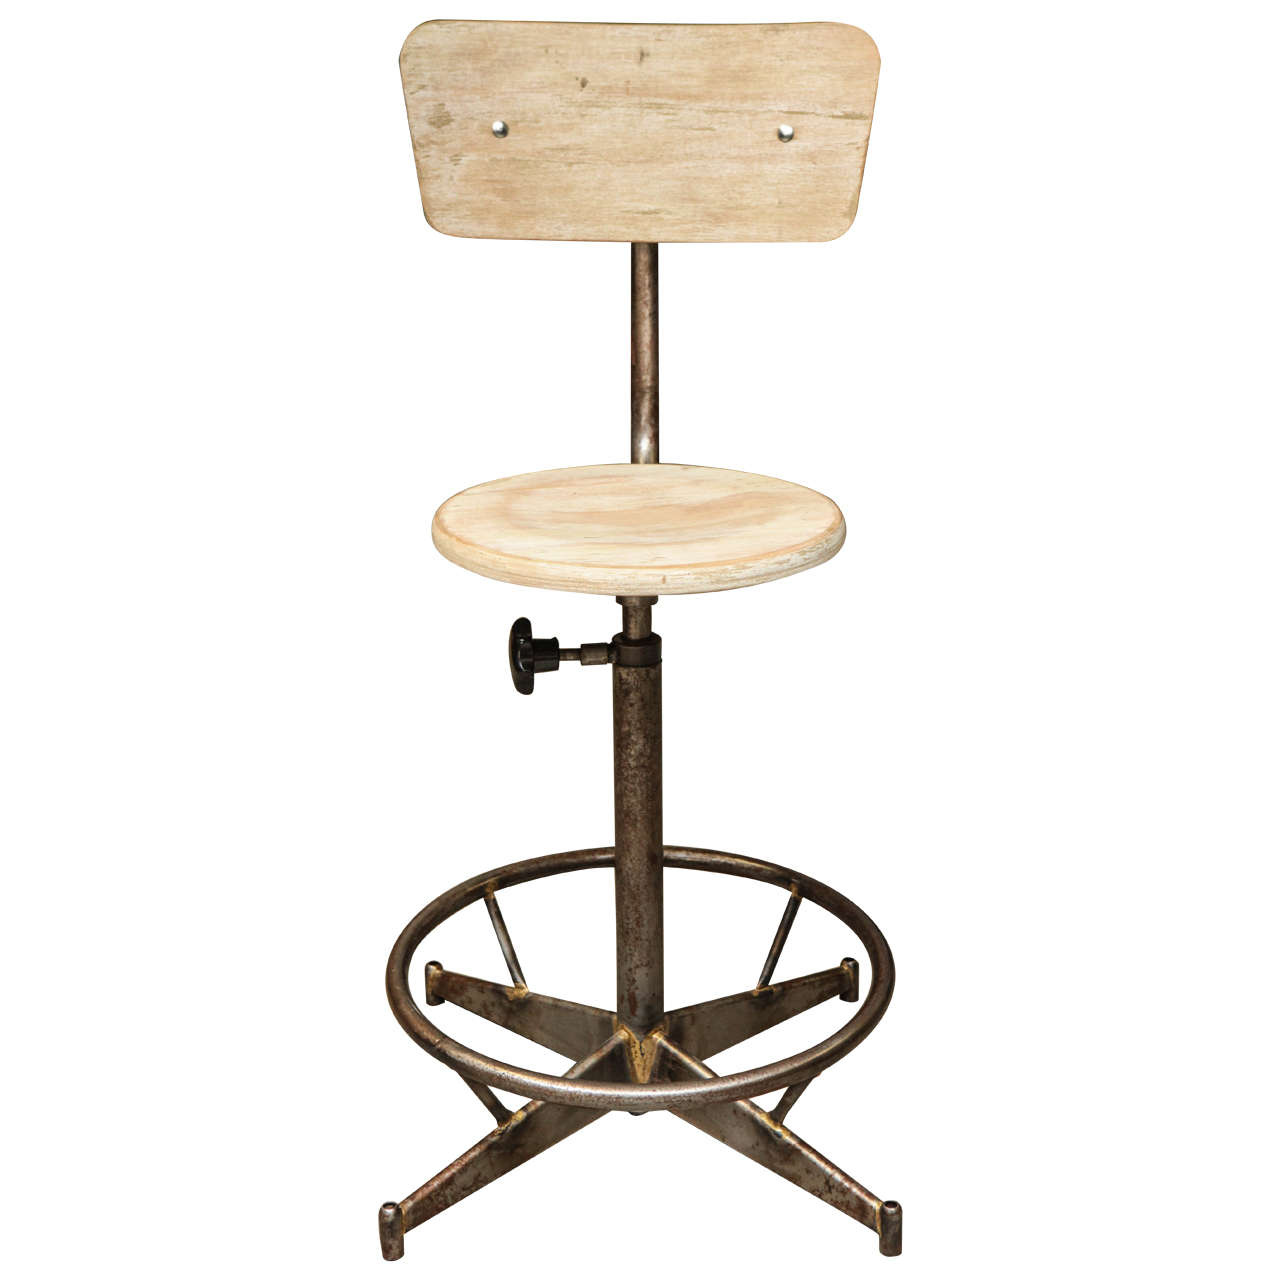 light wood and metal adjustable swivel high chair at 1stdibs